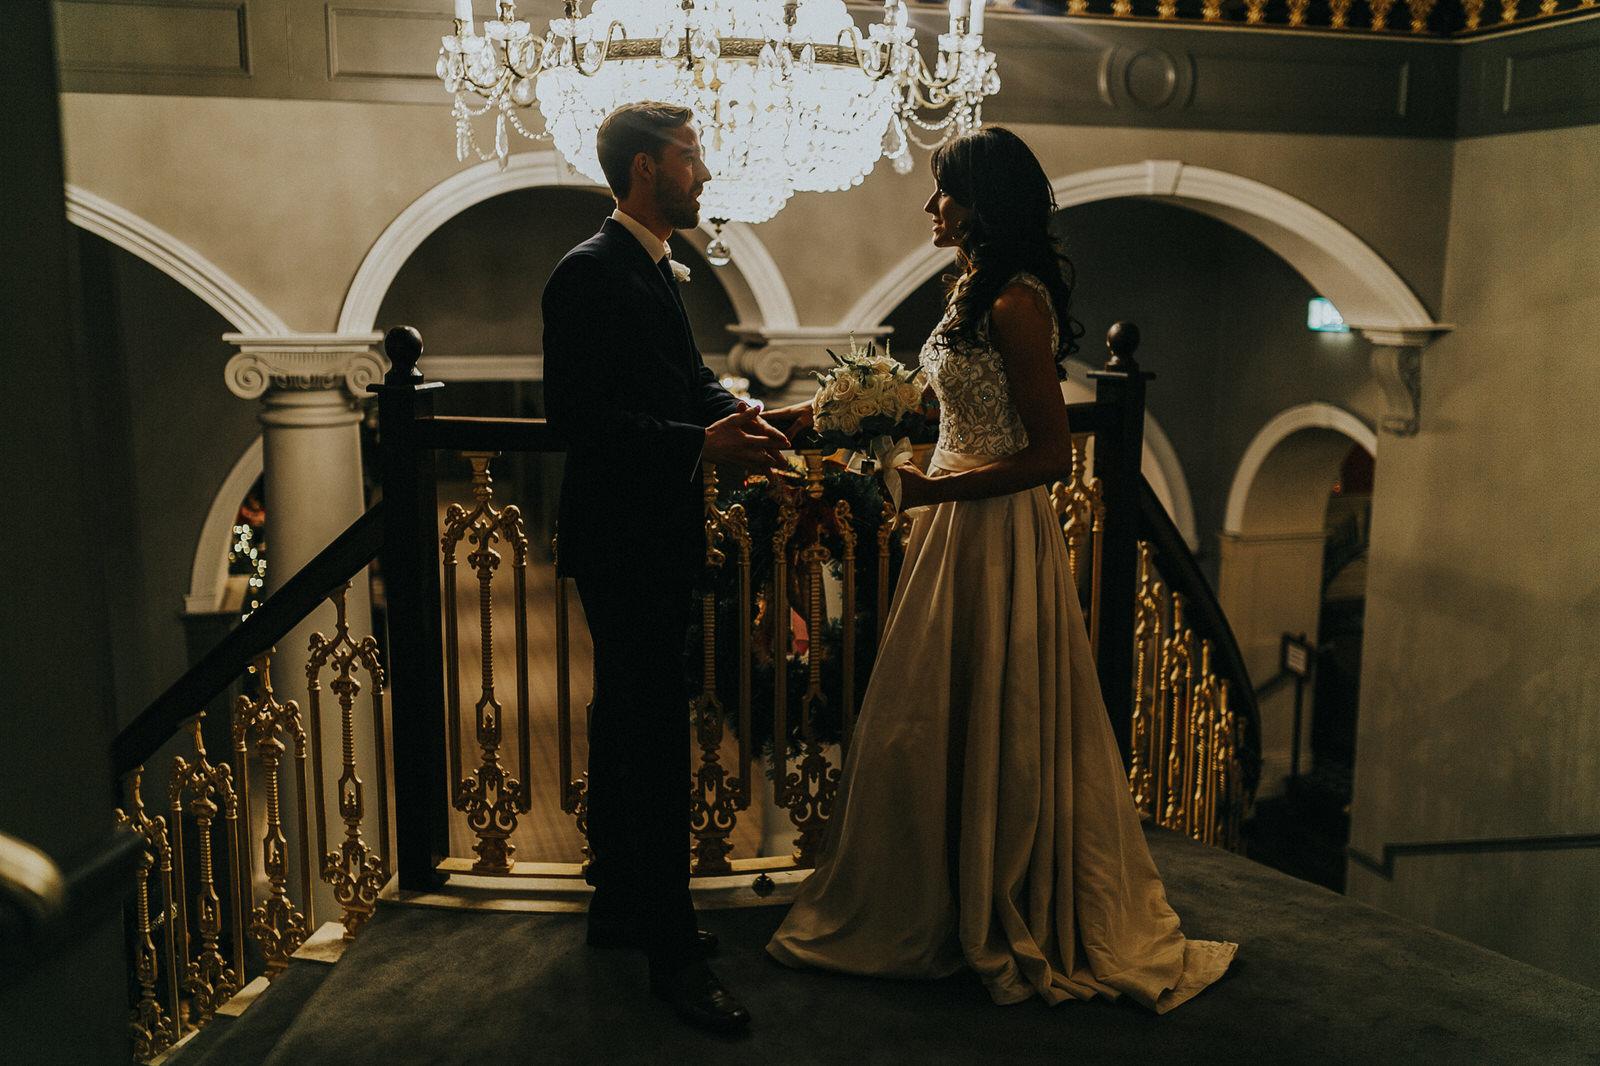 Roger_Kenny_wedding_photographer_478.jpg